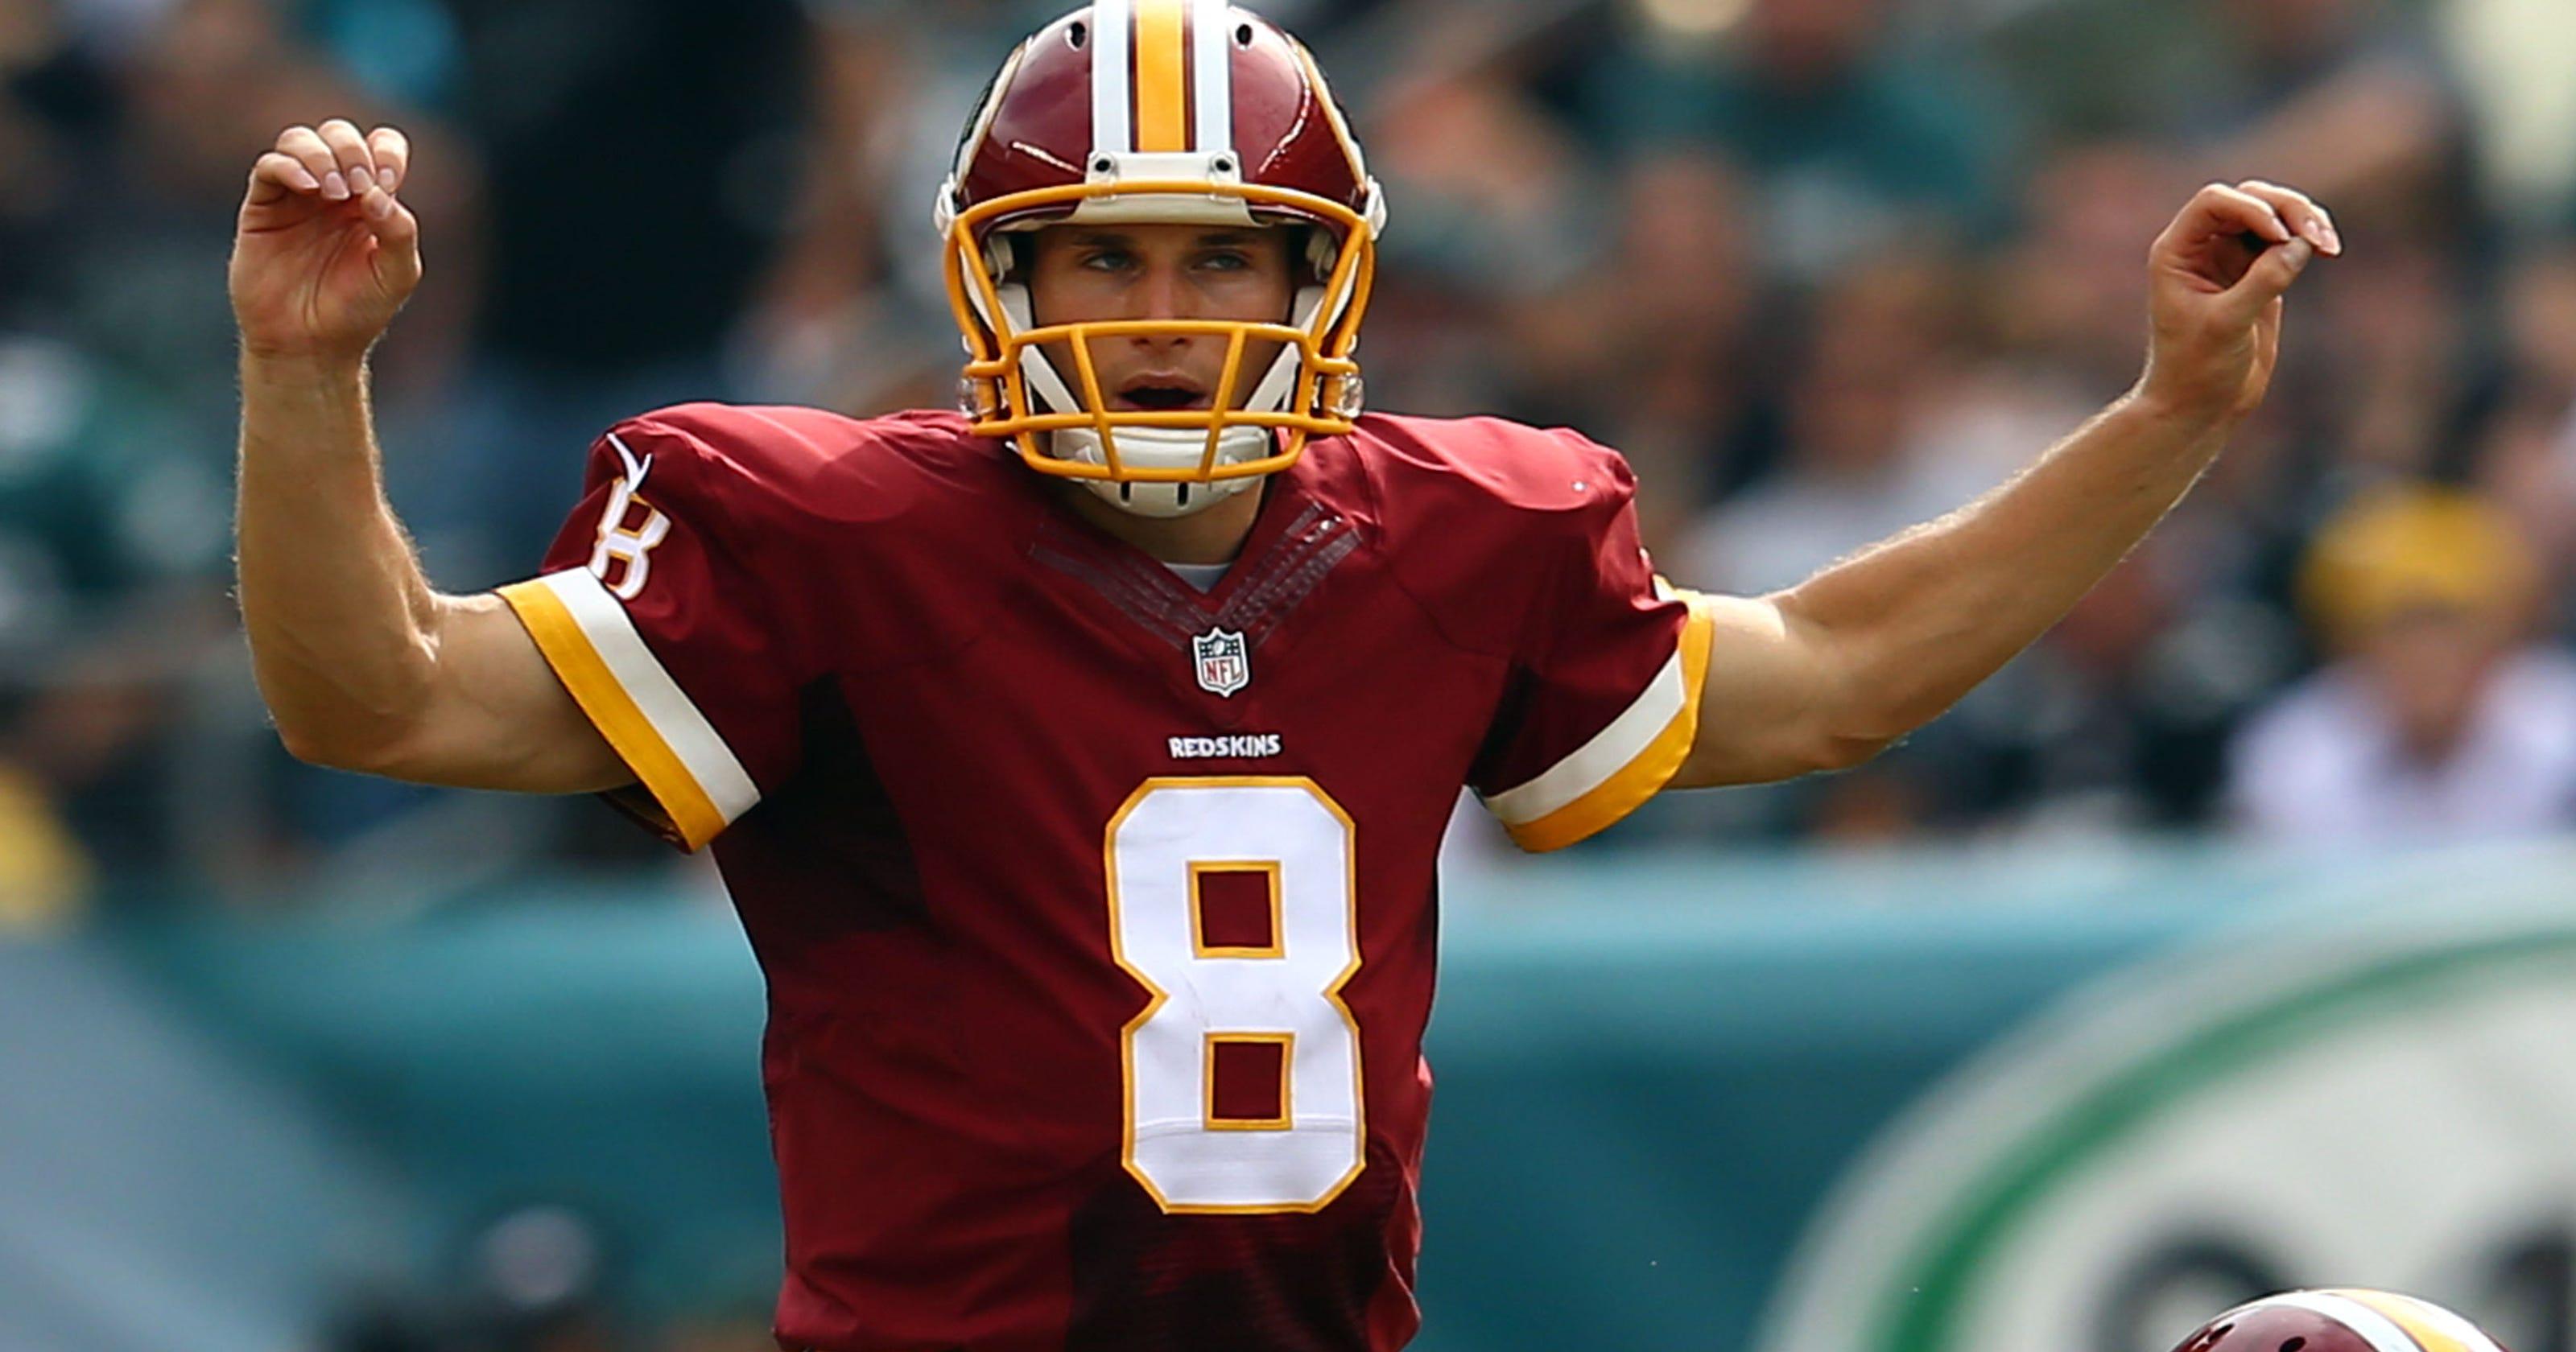 Kirk Cousins isn t afraid to lead as Redskins  starting quarterback c337fa6fa